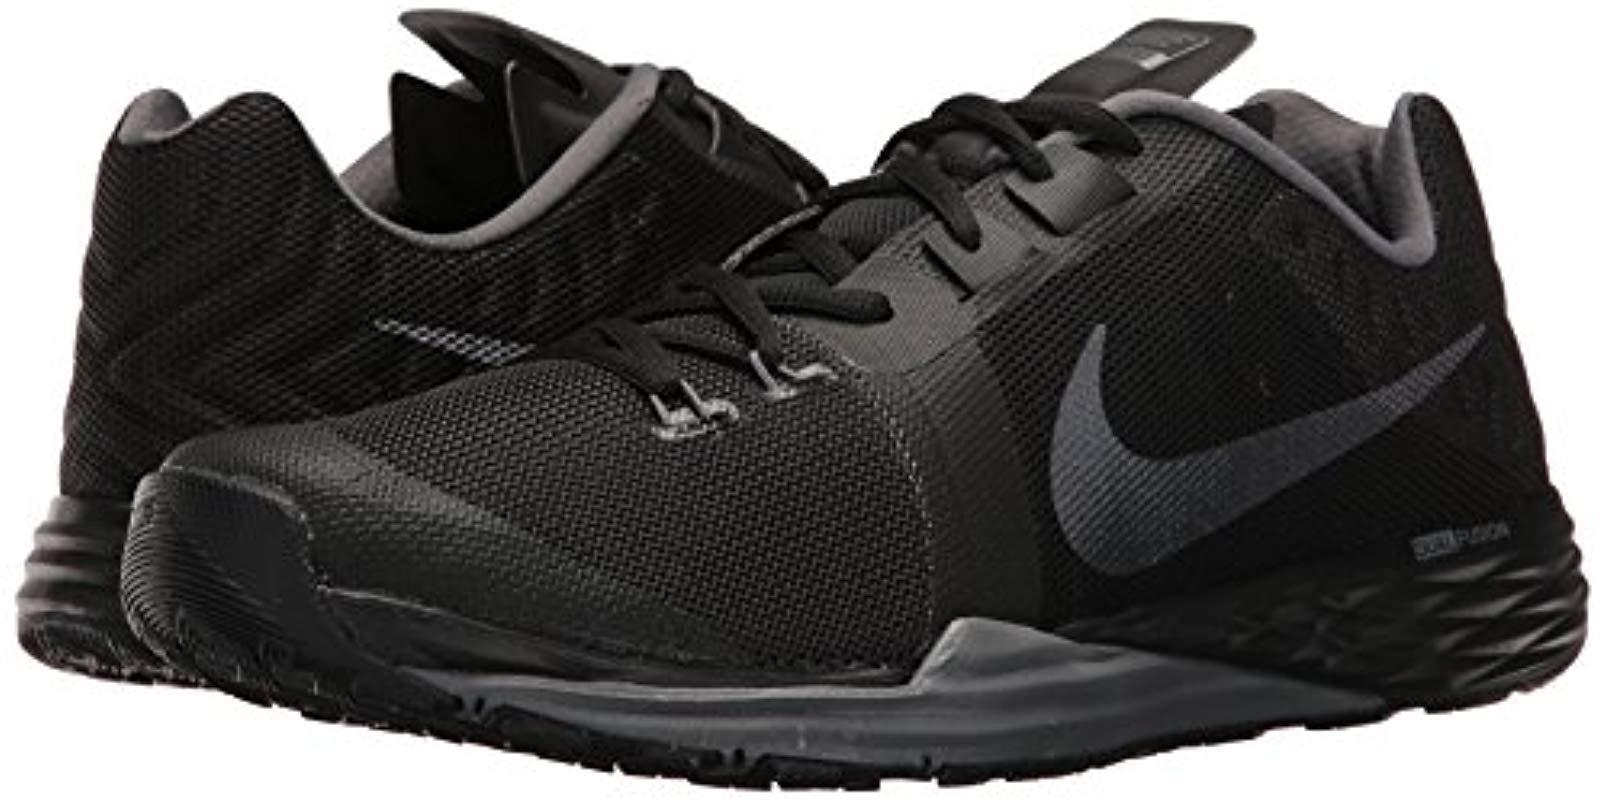 Nike Train Prime Iron Df Cross Trainer